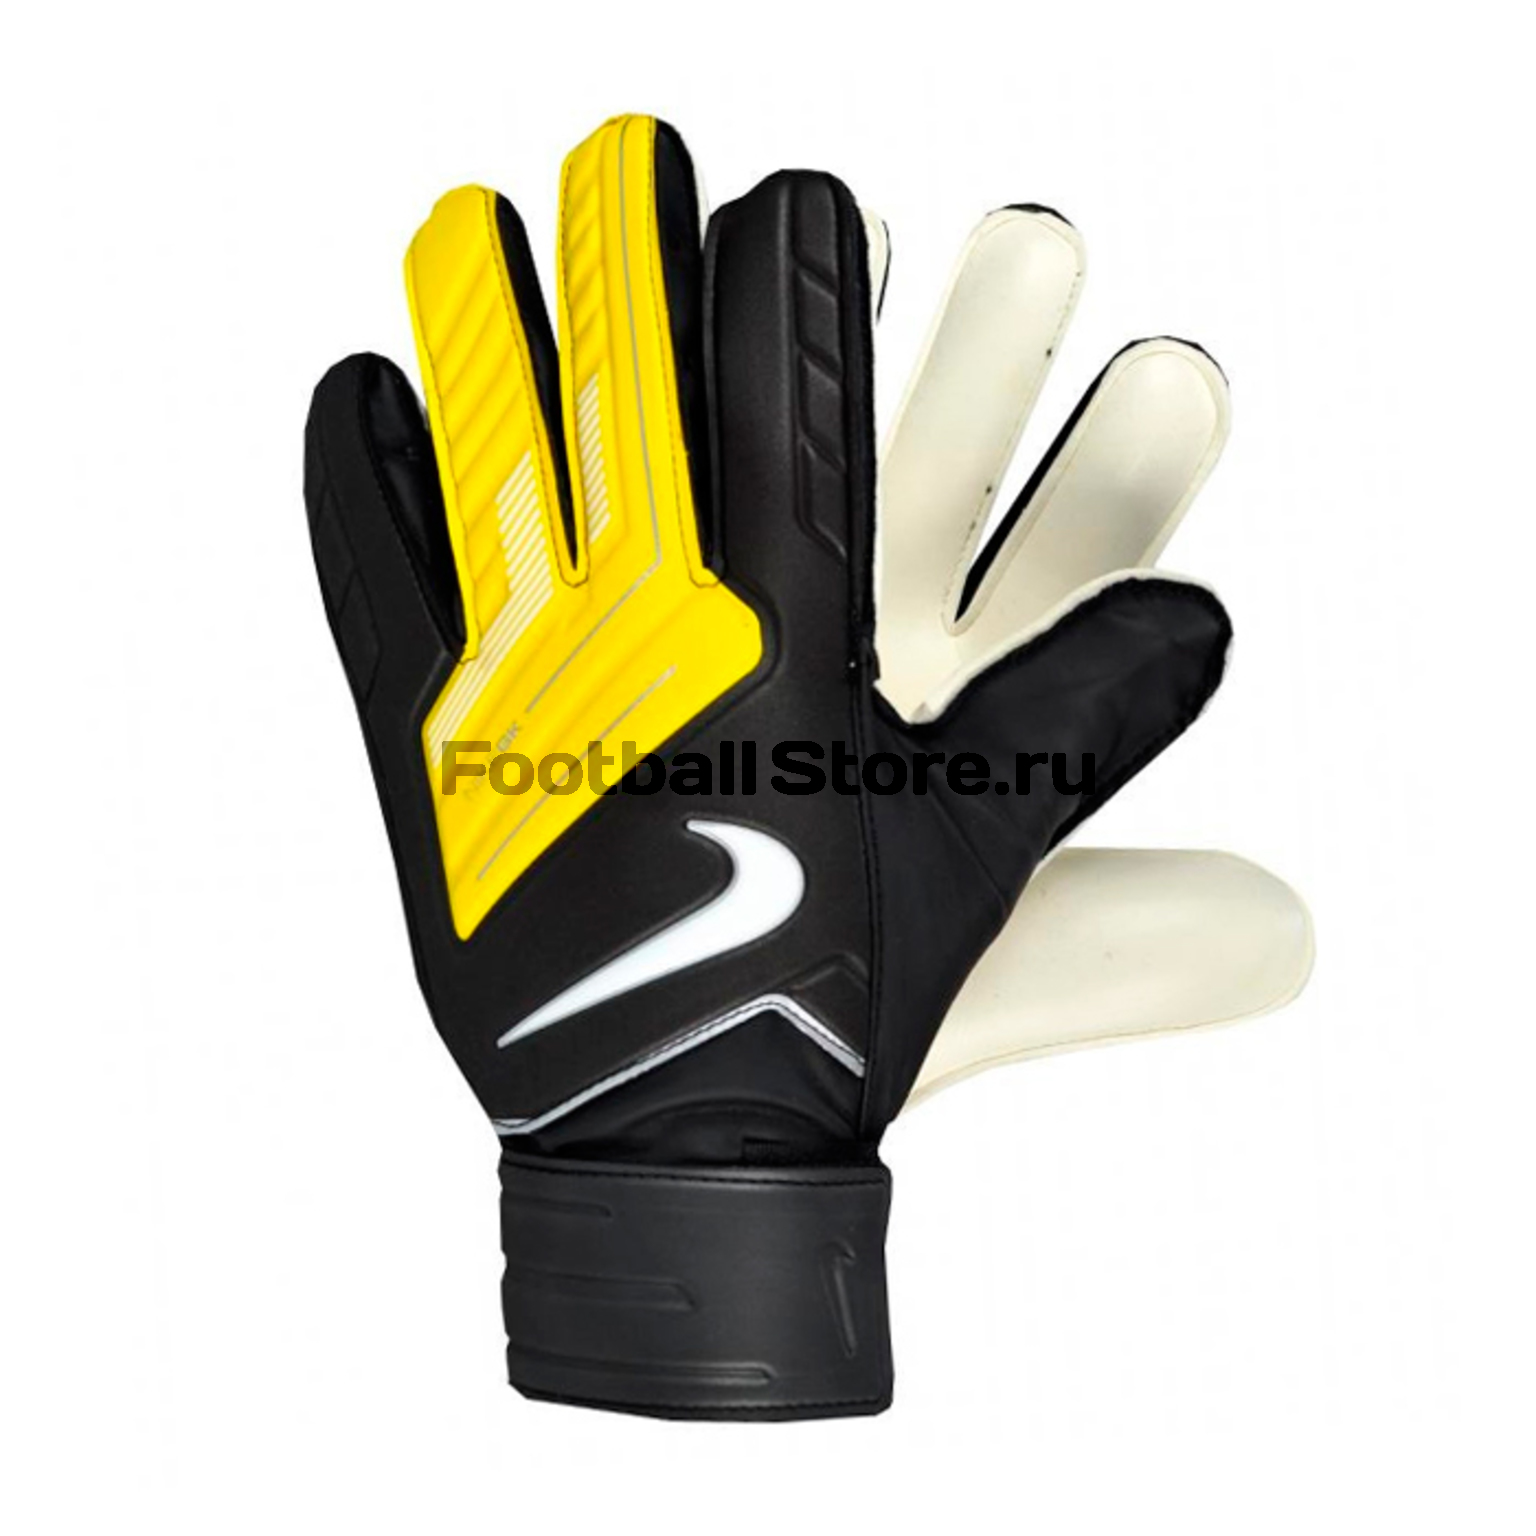 Перчатки Nike Вратарские перчатки Nike gk match